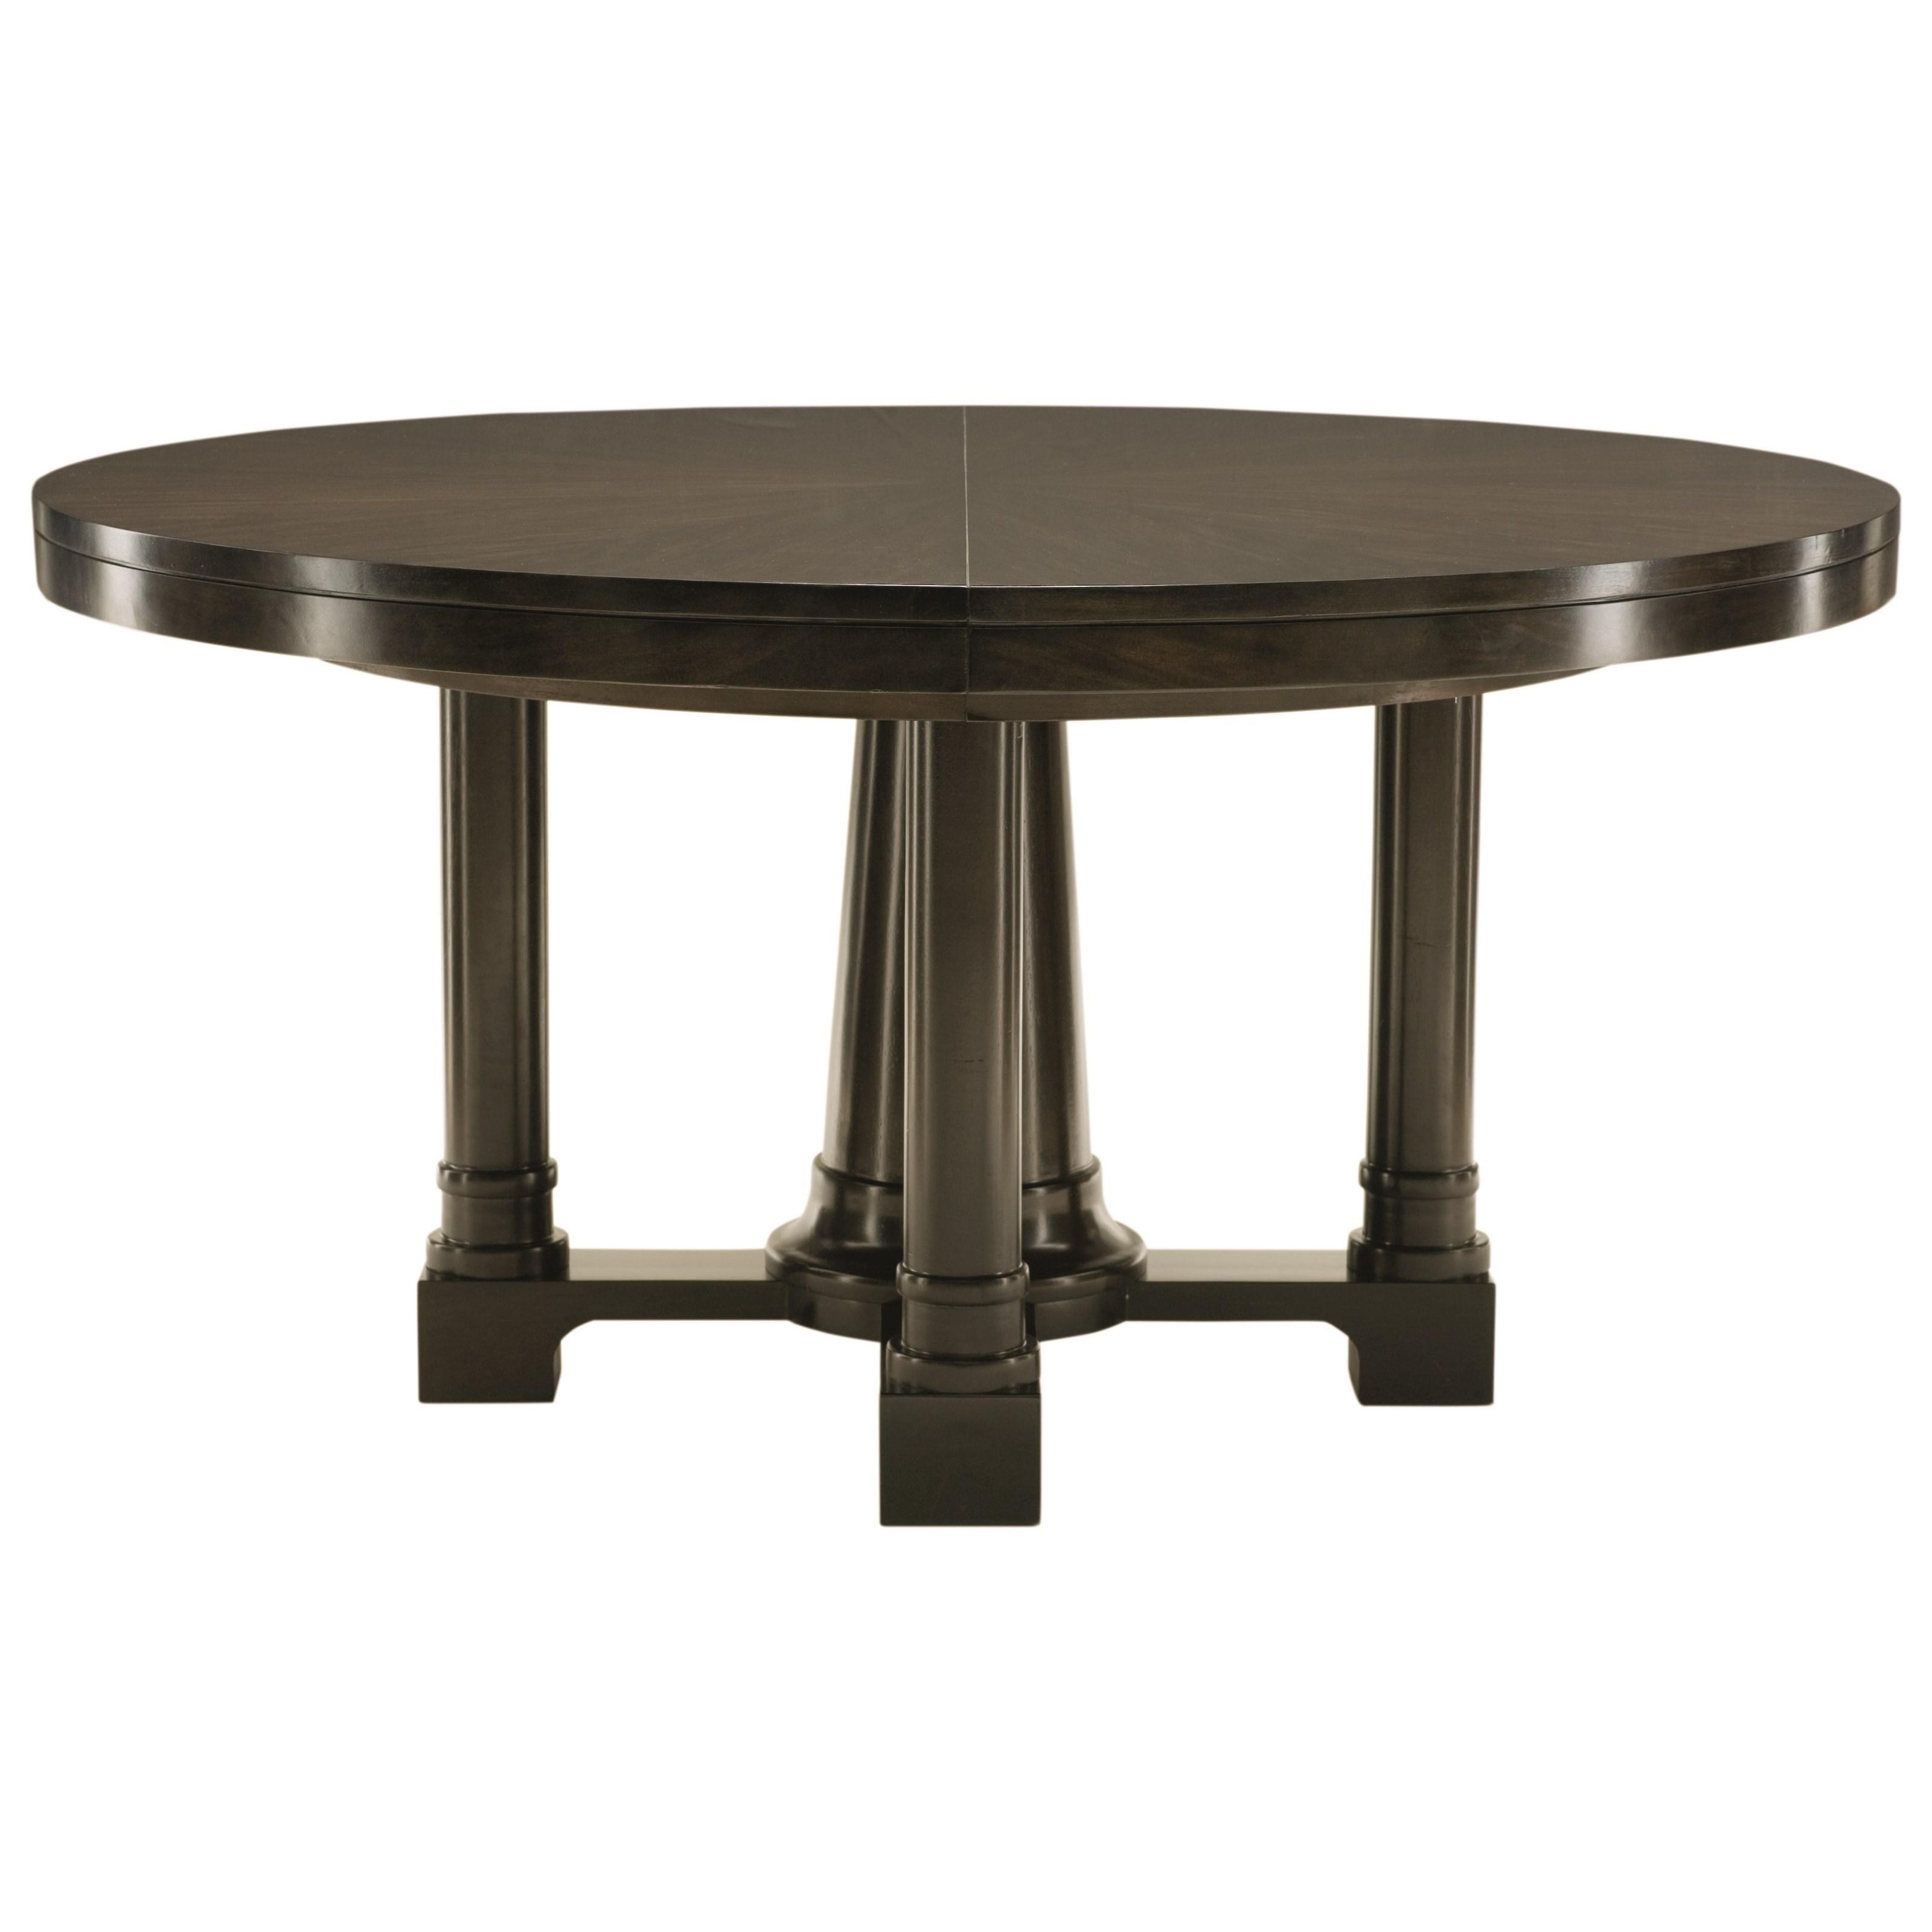 bernhardt sutton house round pedestal dining table with 20 leaf dream home furniture dining. Black Bedroom Furniture Sets. Home Design Ideas